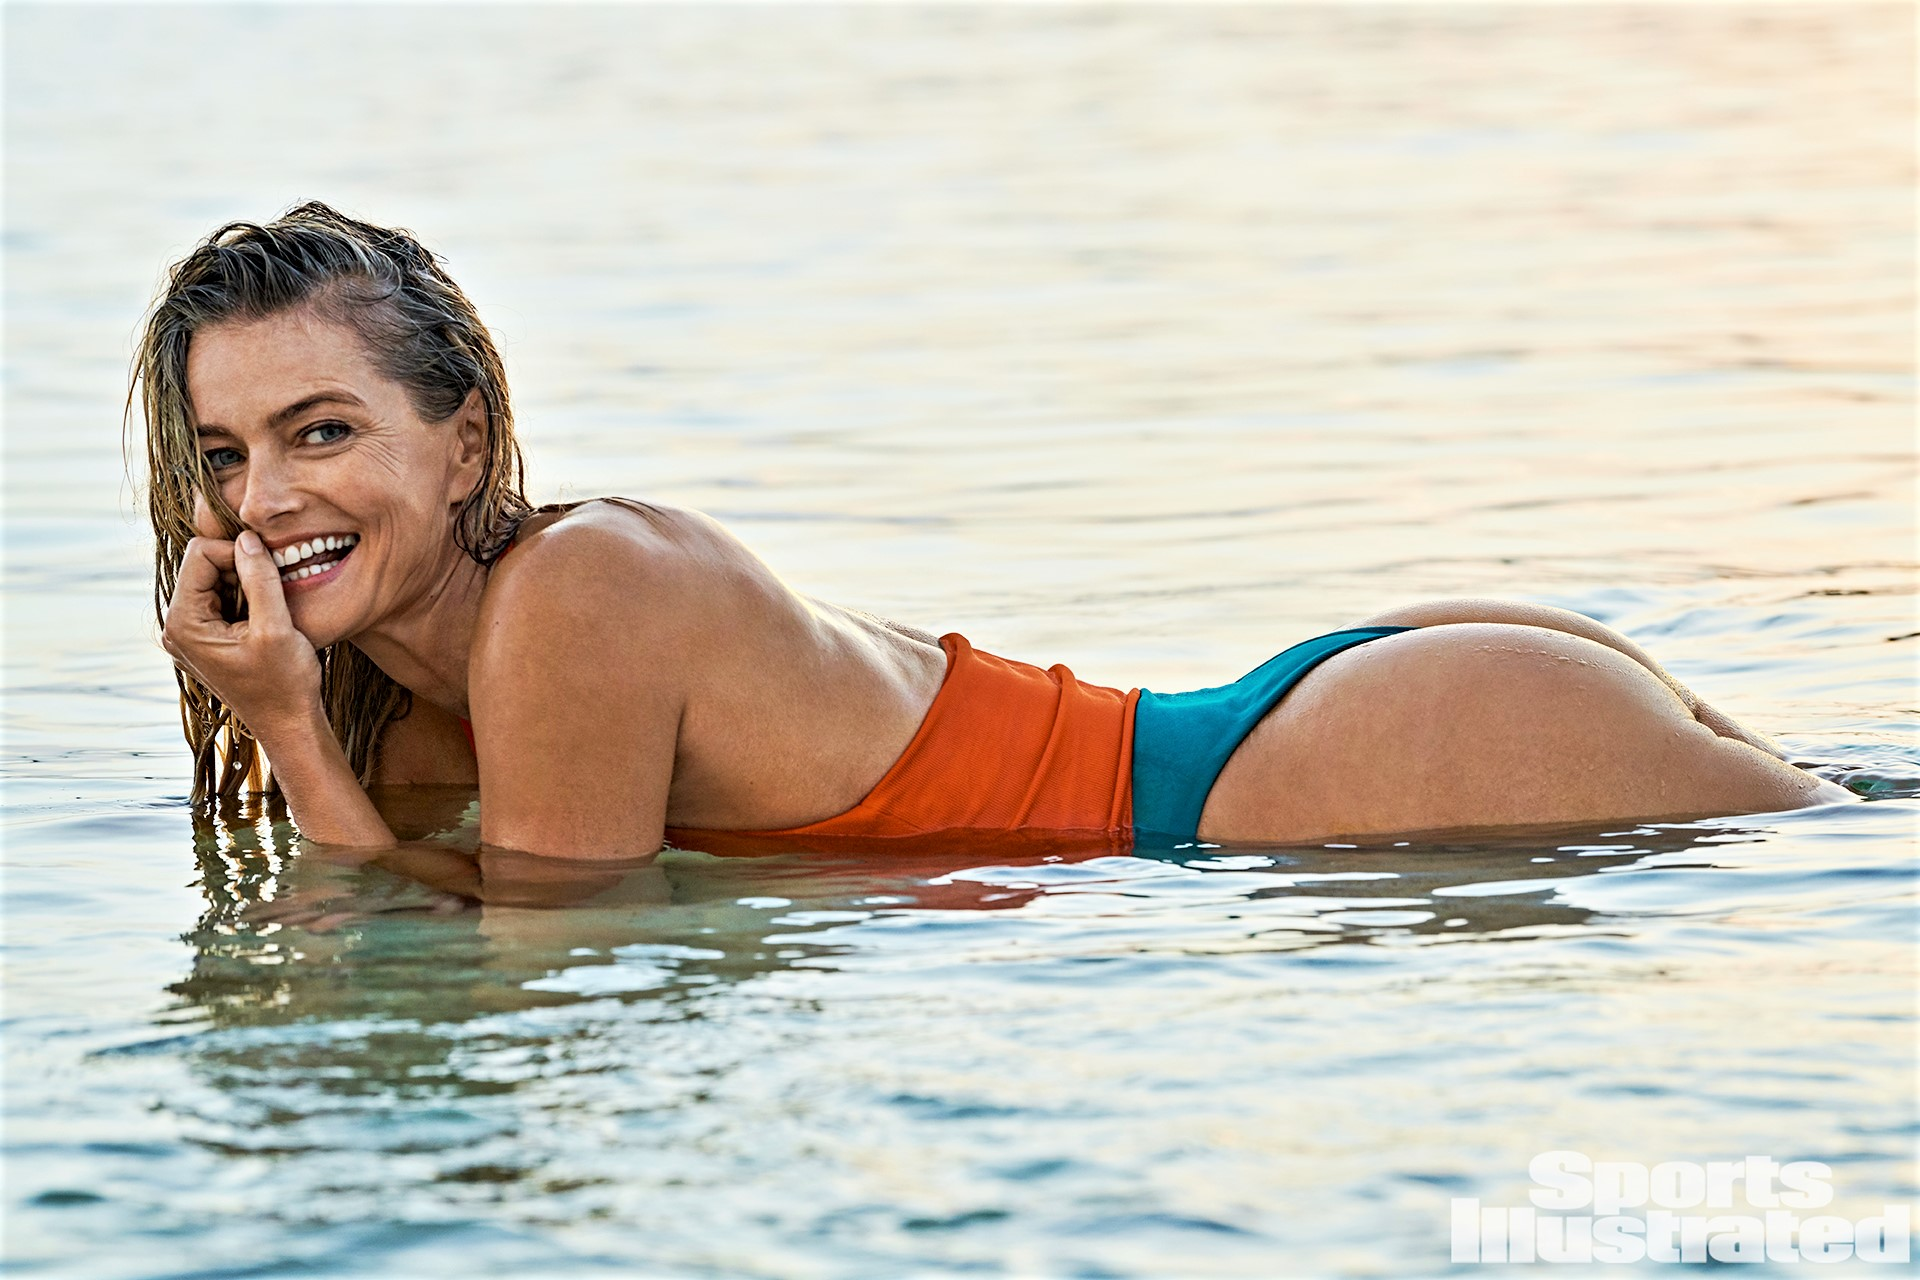 Paulina Porizkova by Yu Tsai for SI Swimsuit 2019 (6).jpg